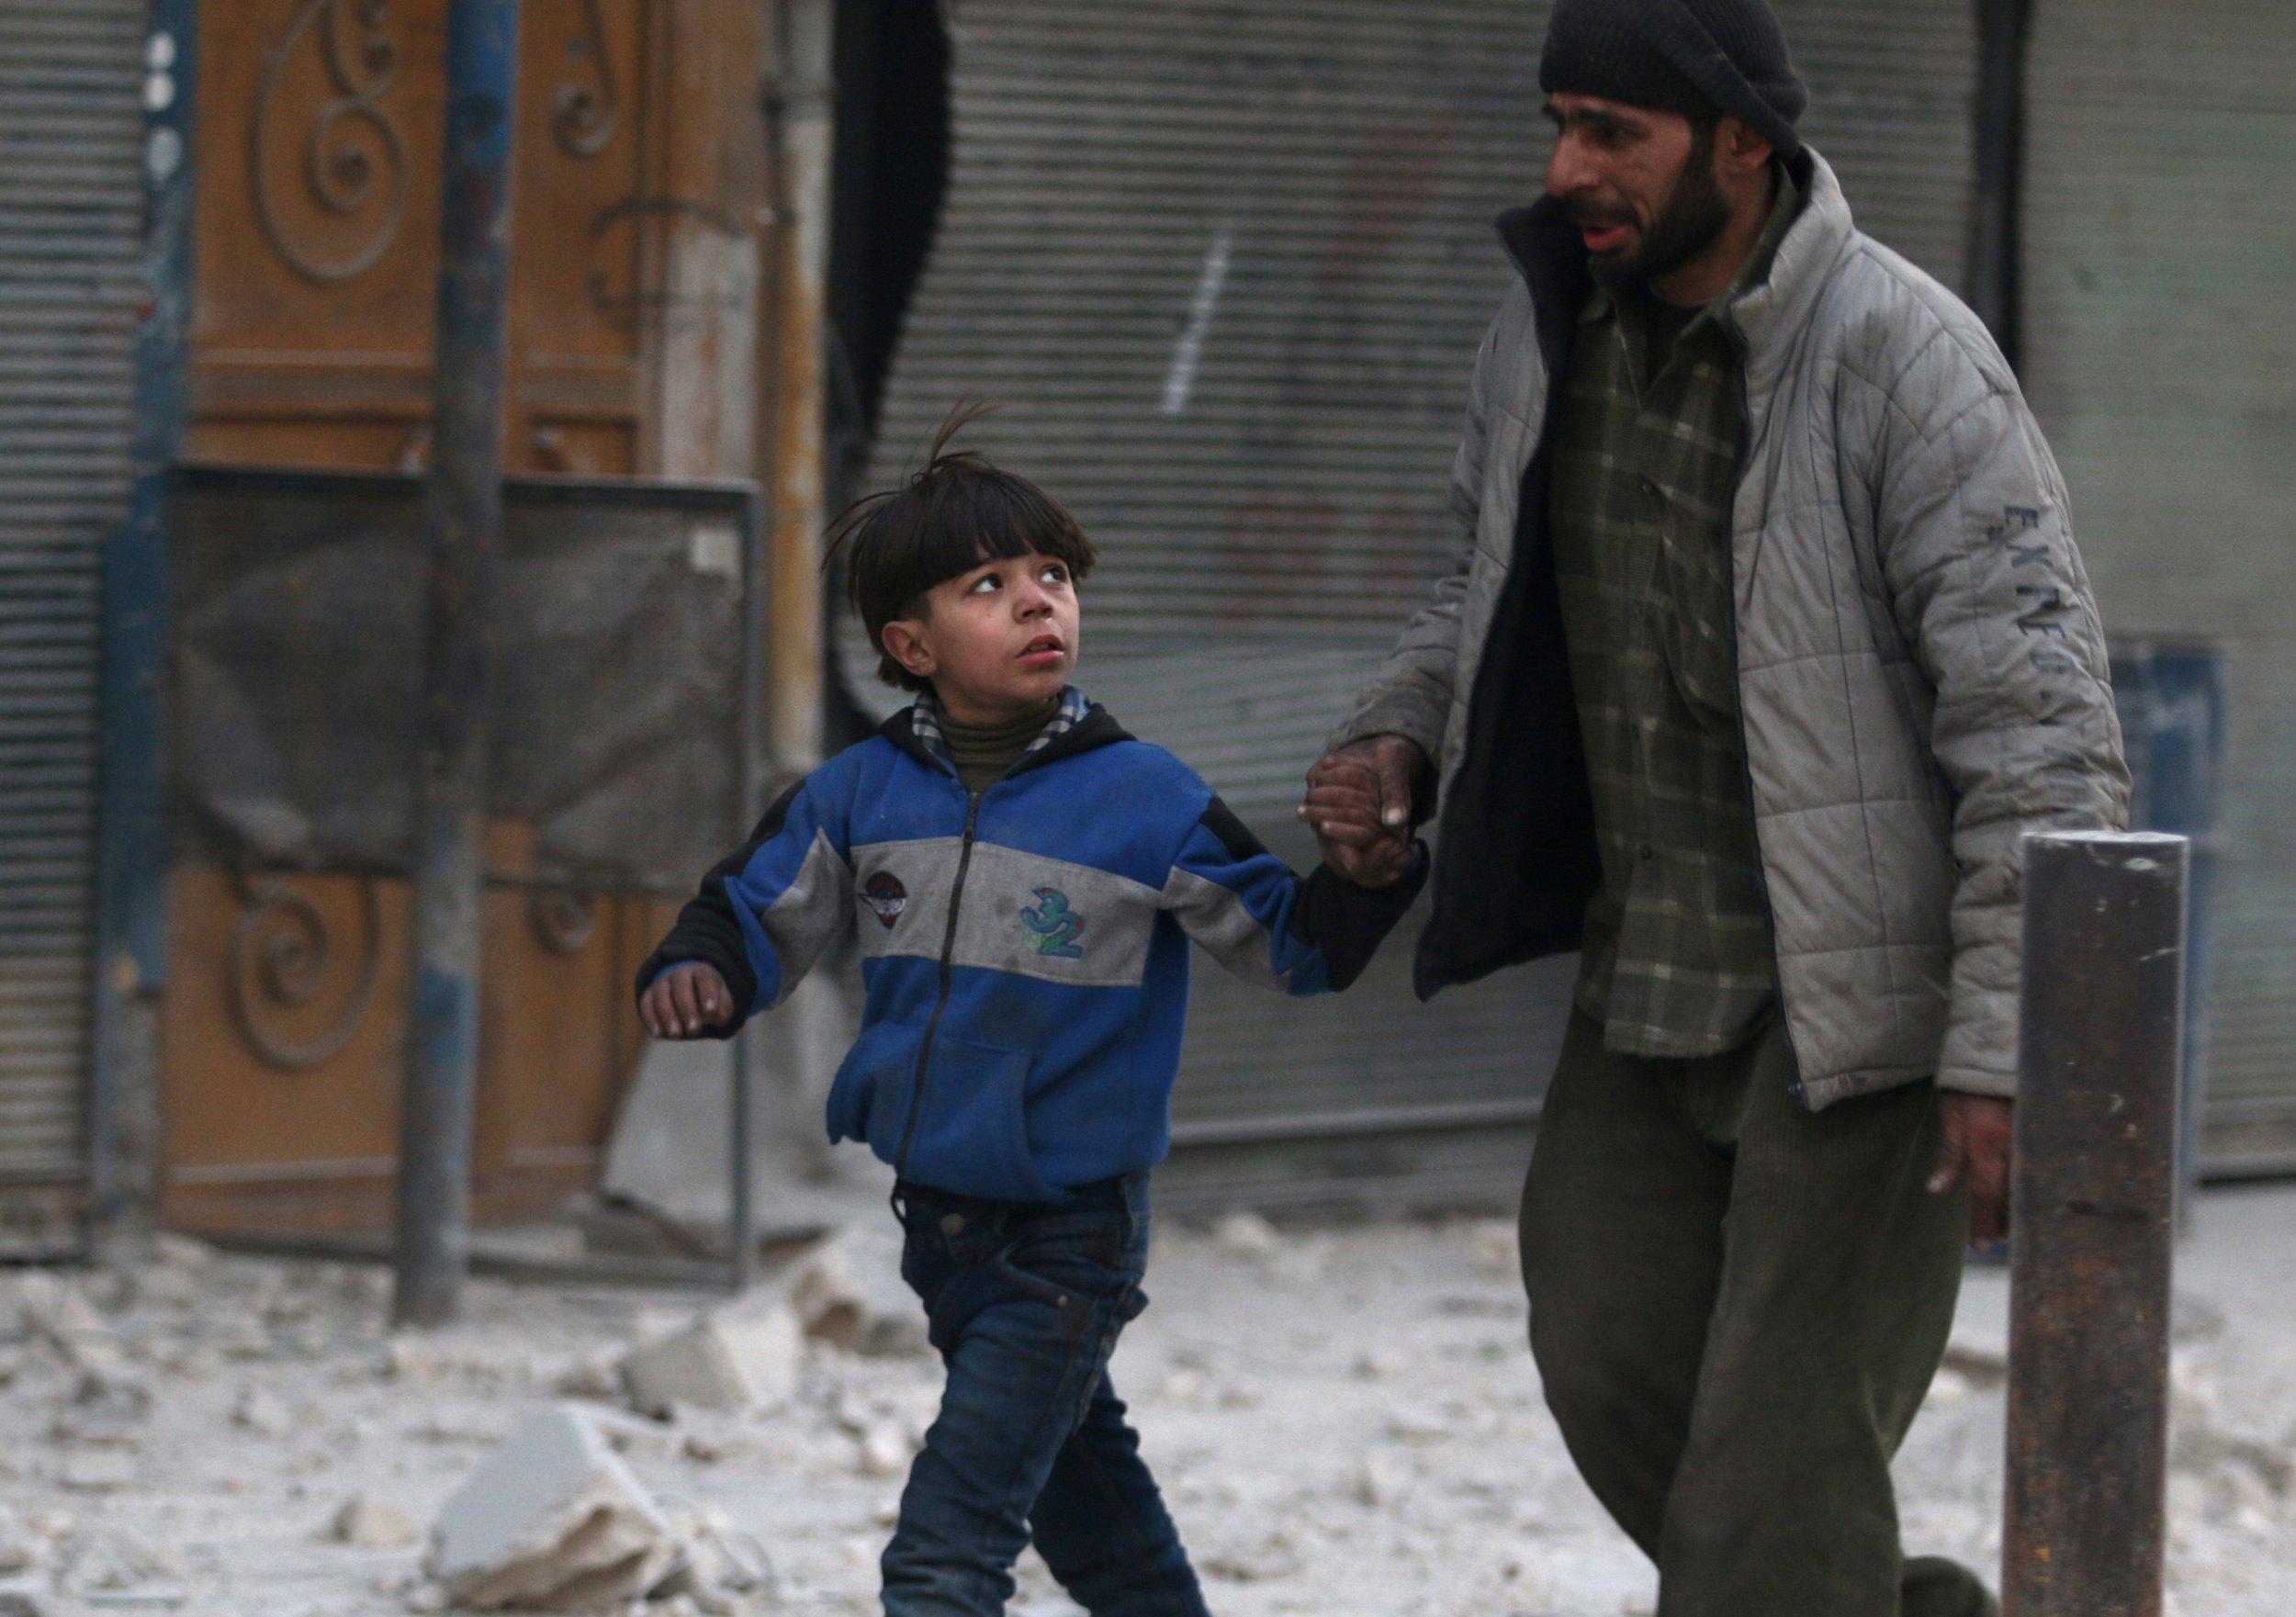 12_13_Kerry_Aleppo_01